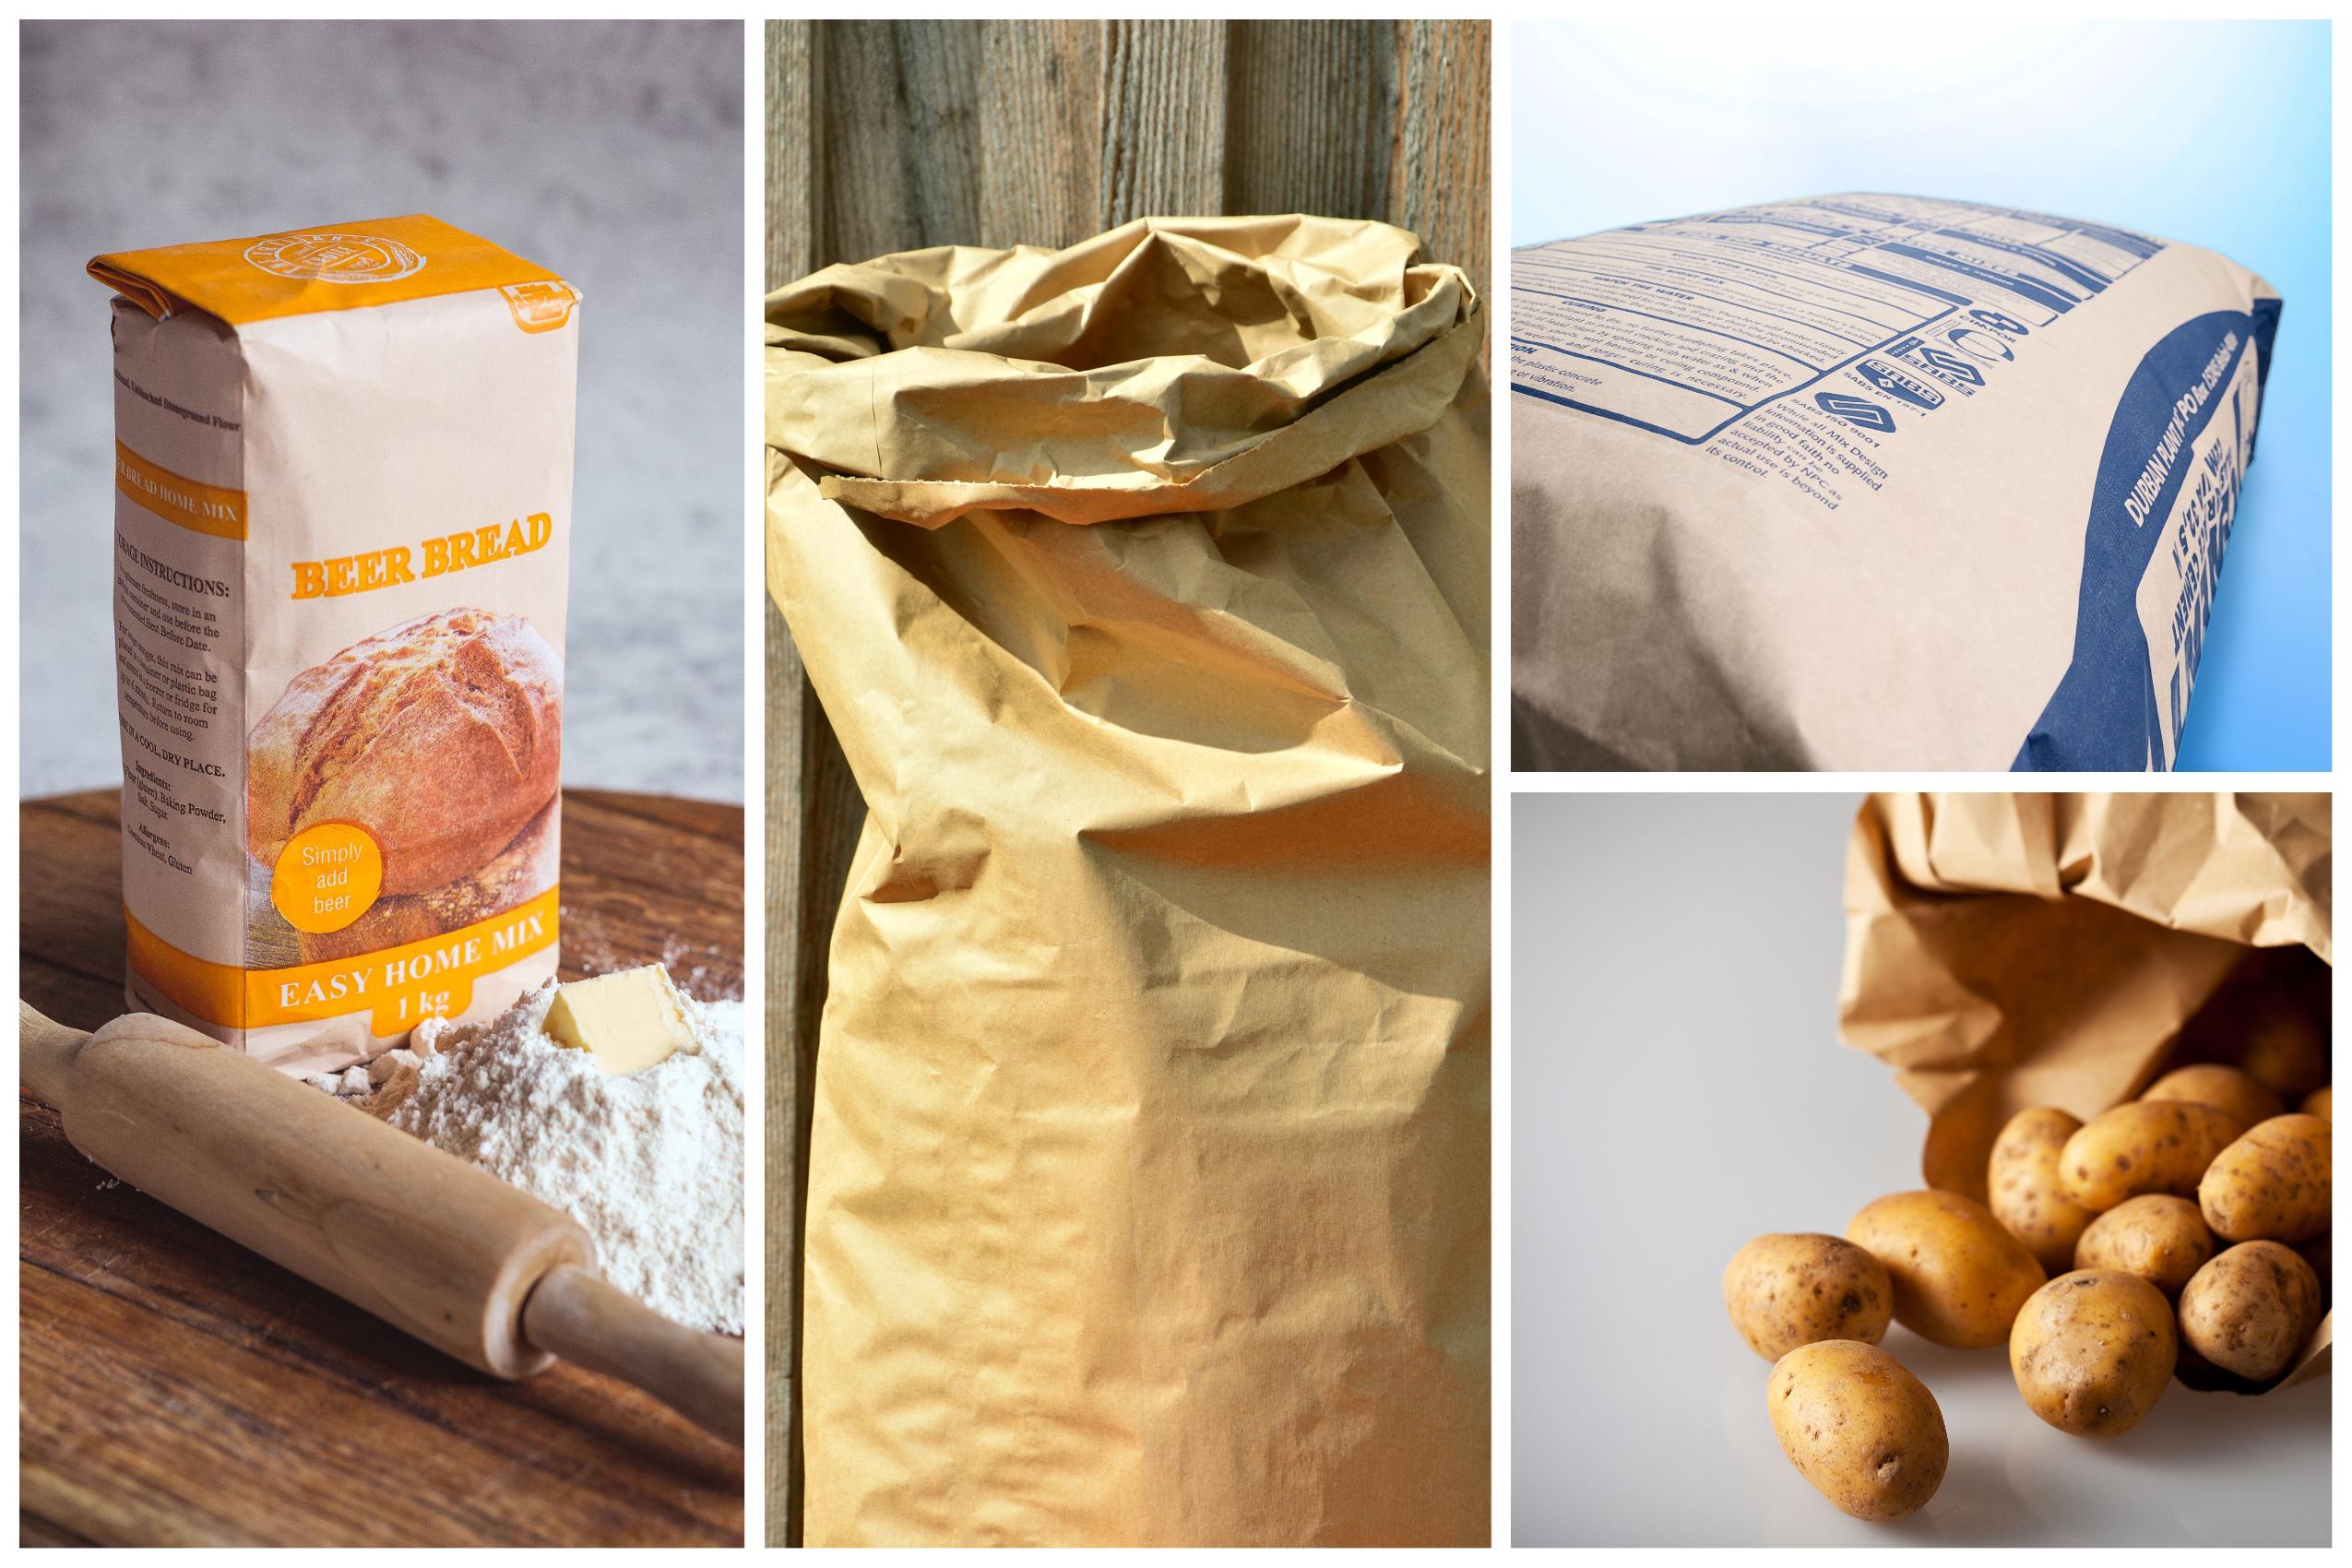 Paper sacks